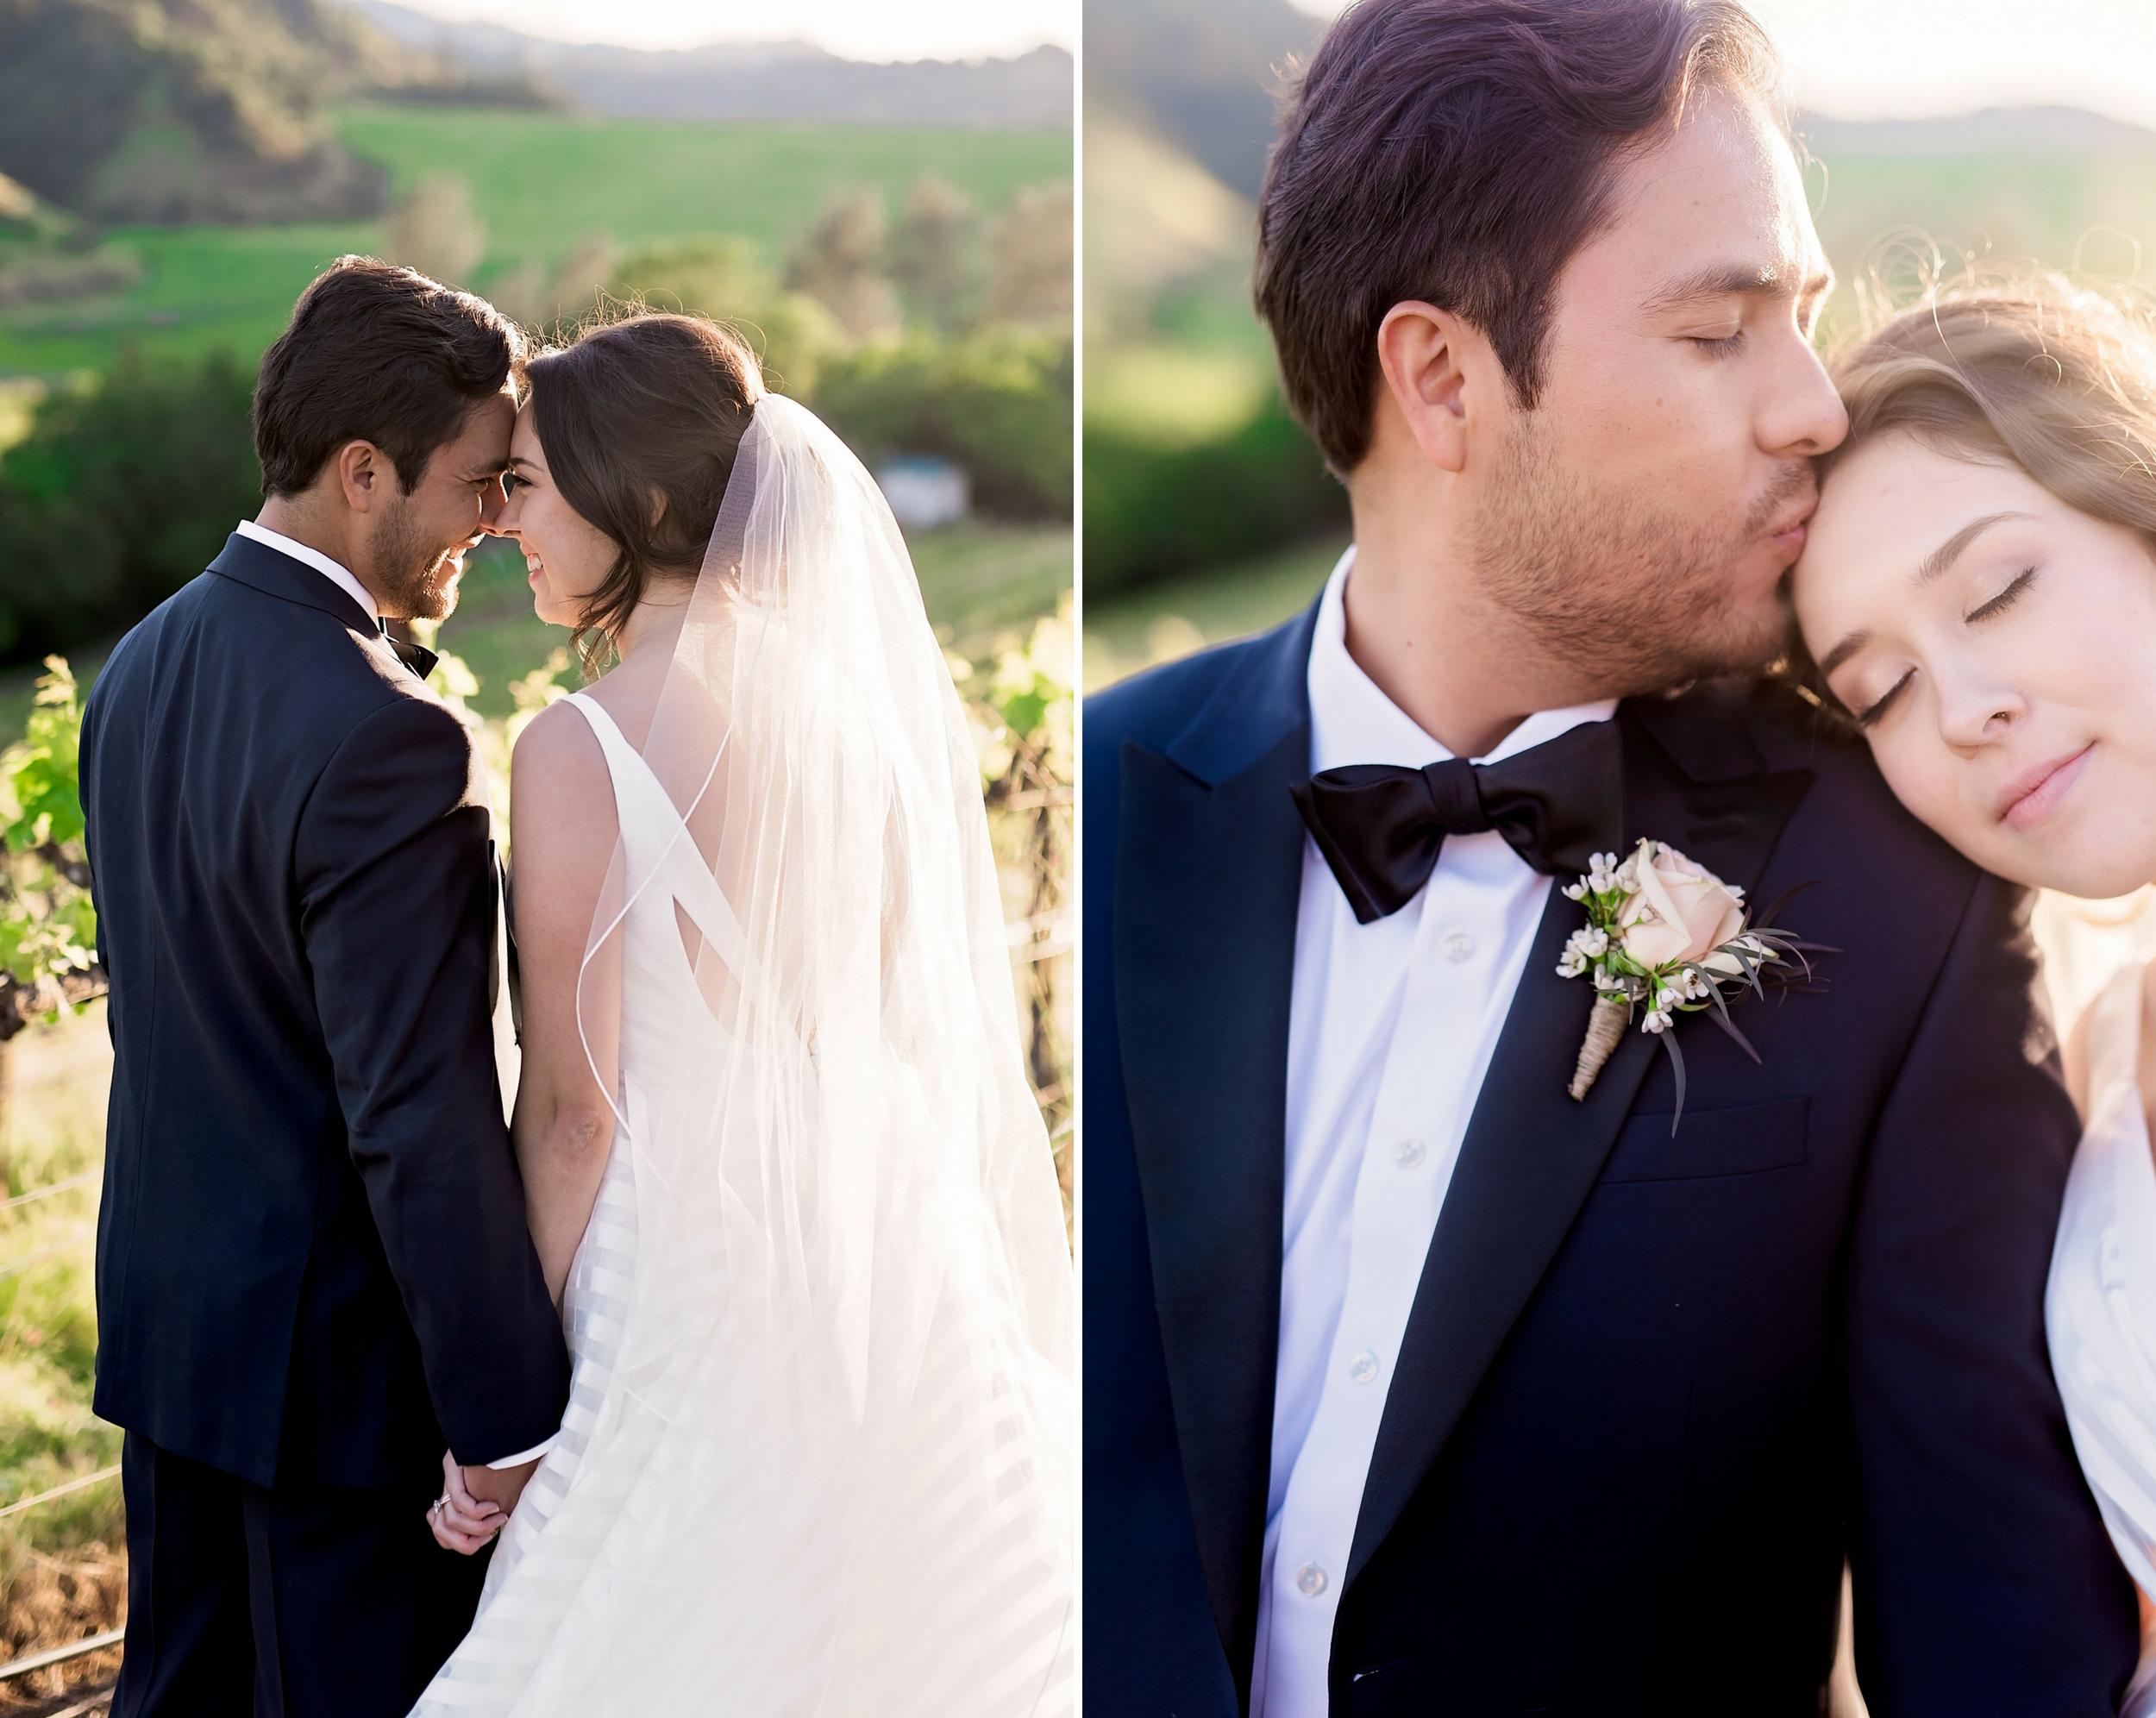 Rachel-Sergio-Wedding-Pharris-Photos-11.jpg